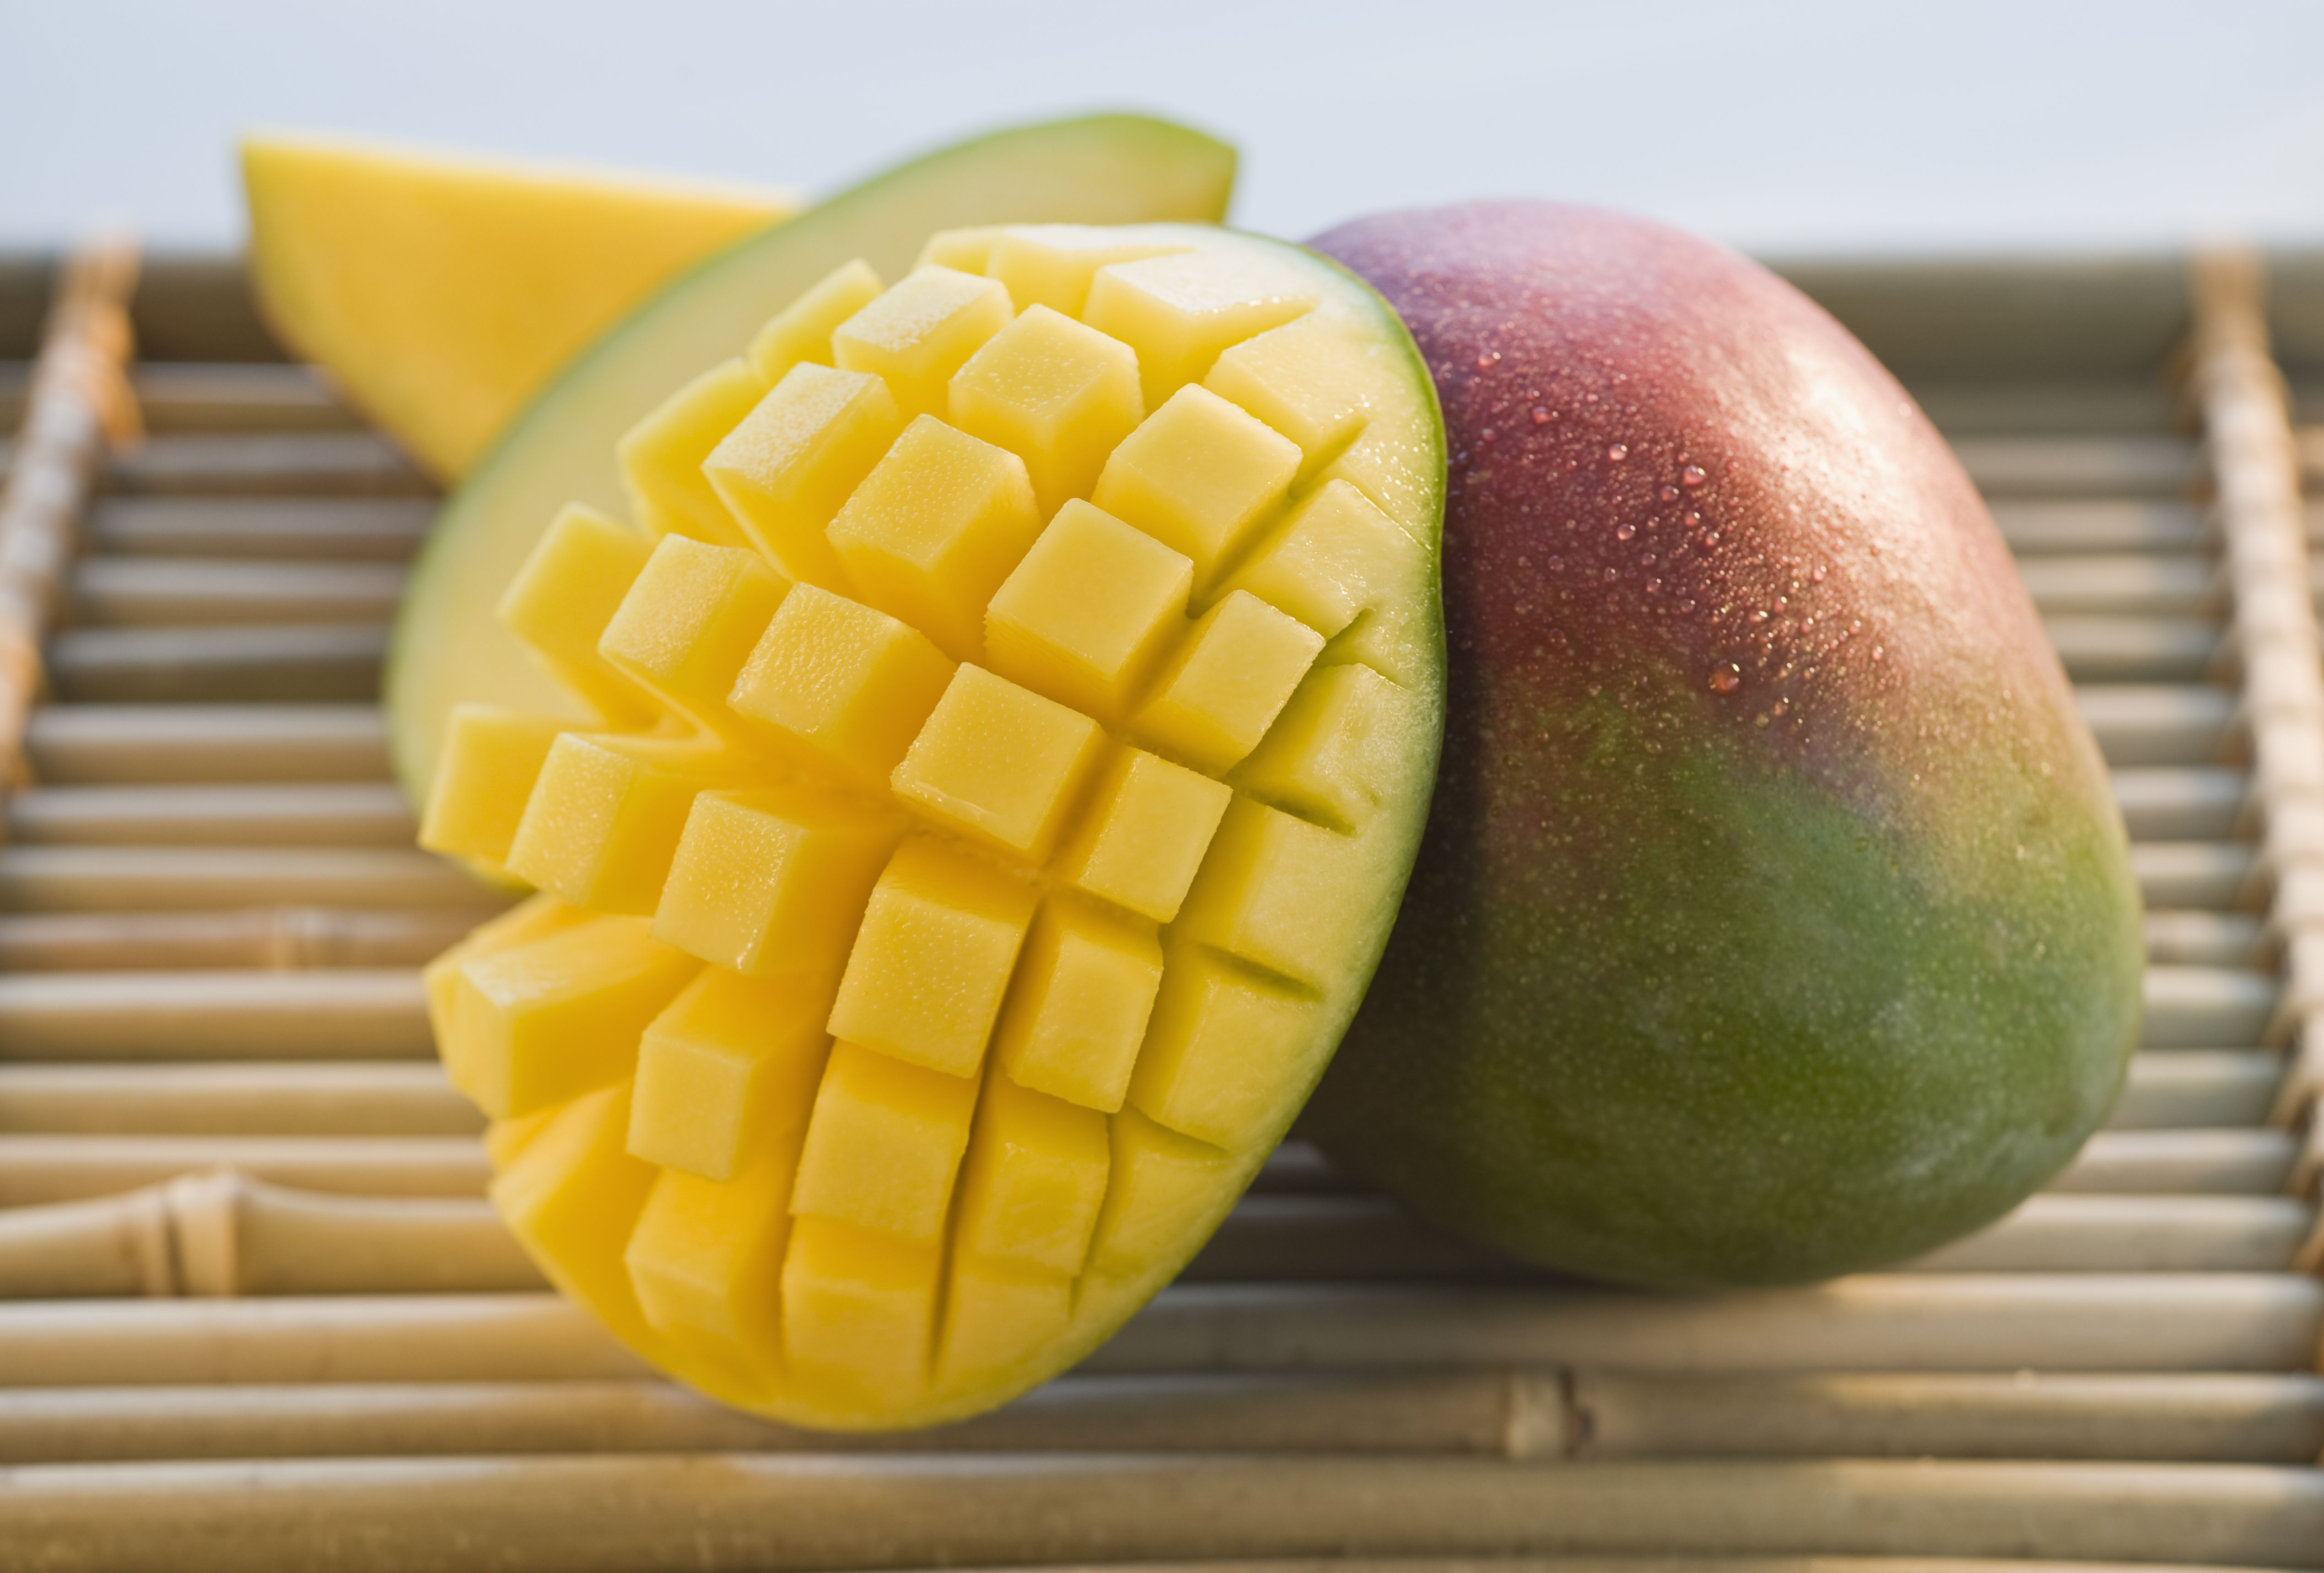 Mango cut into a grid on a bamboo tray